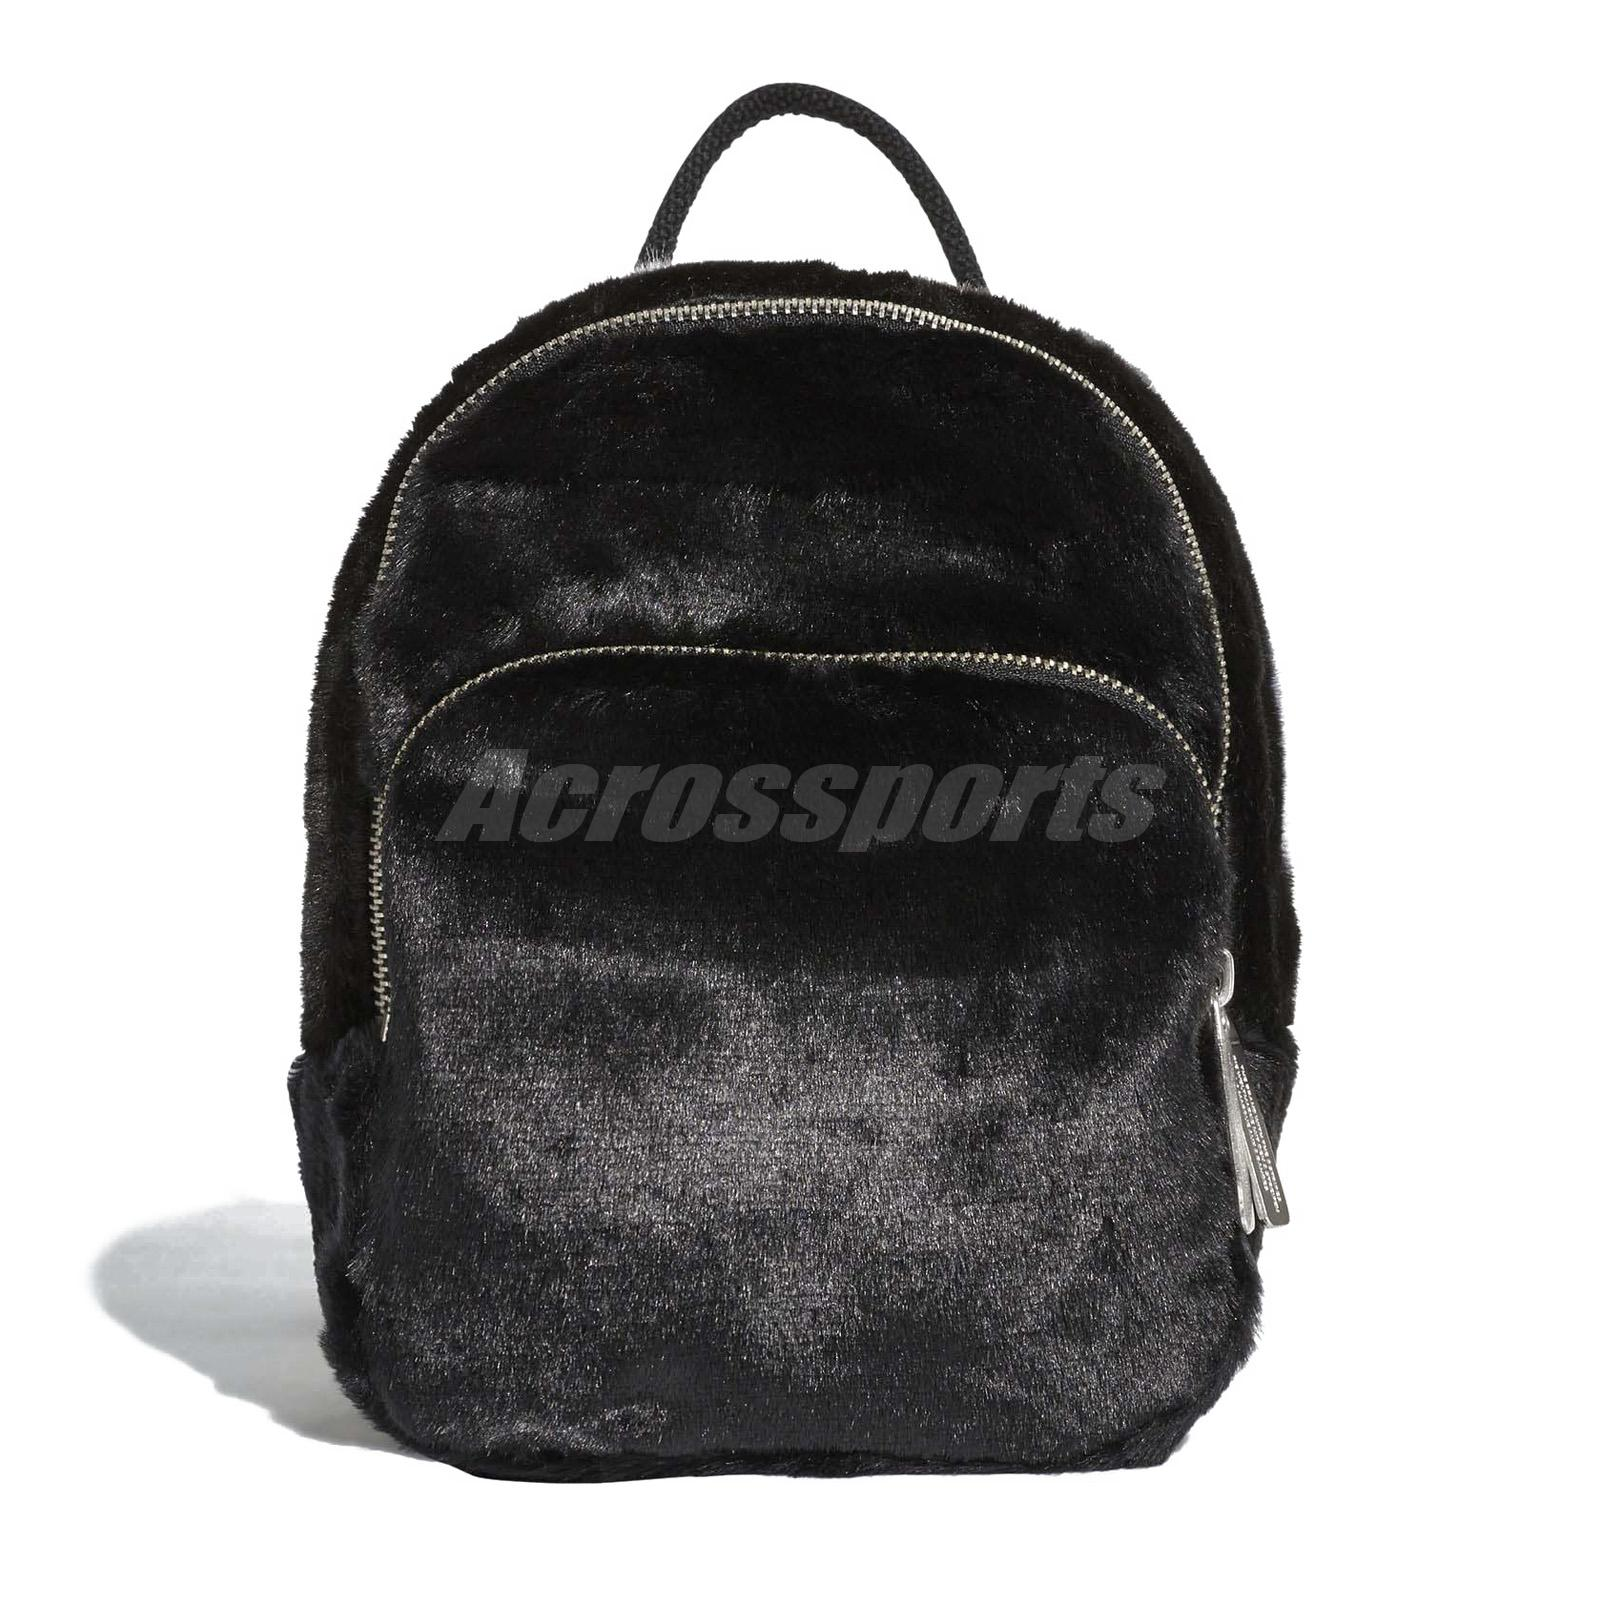 005544543255 adidas Originals Mini Classic Backpack Plush Faux Fur Bag Women Gym Black  DH4372